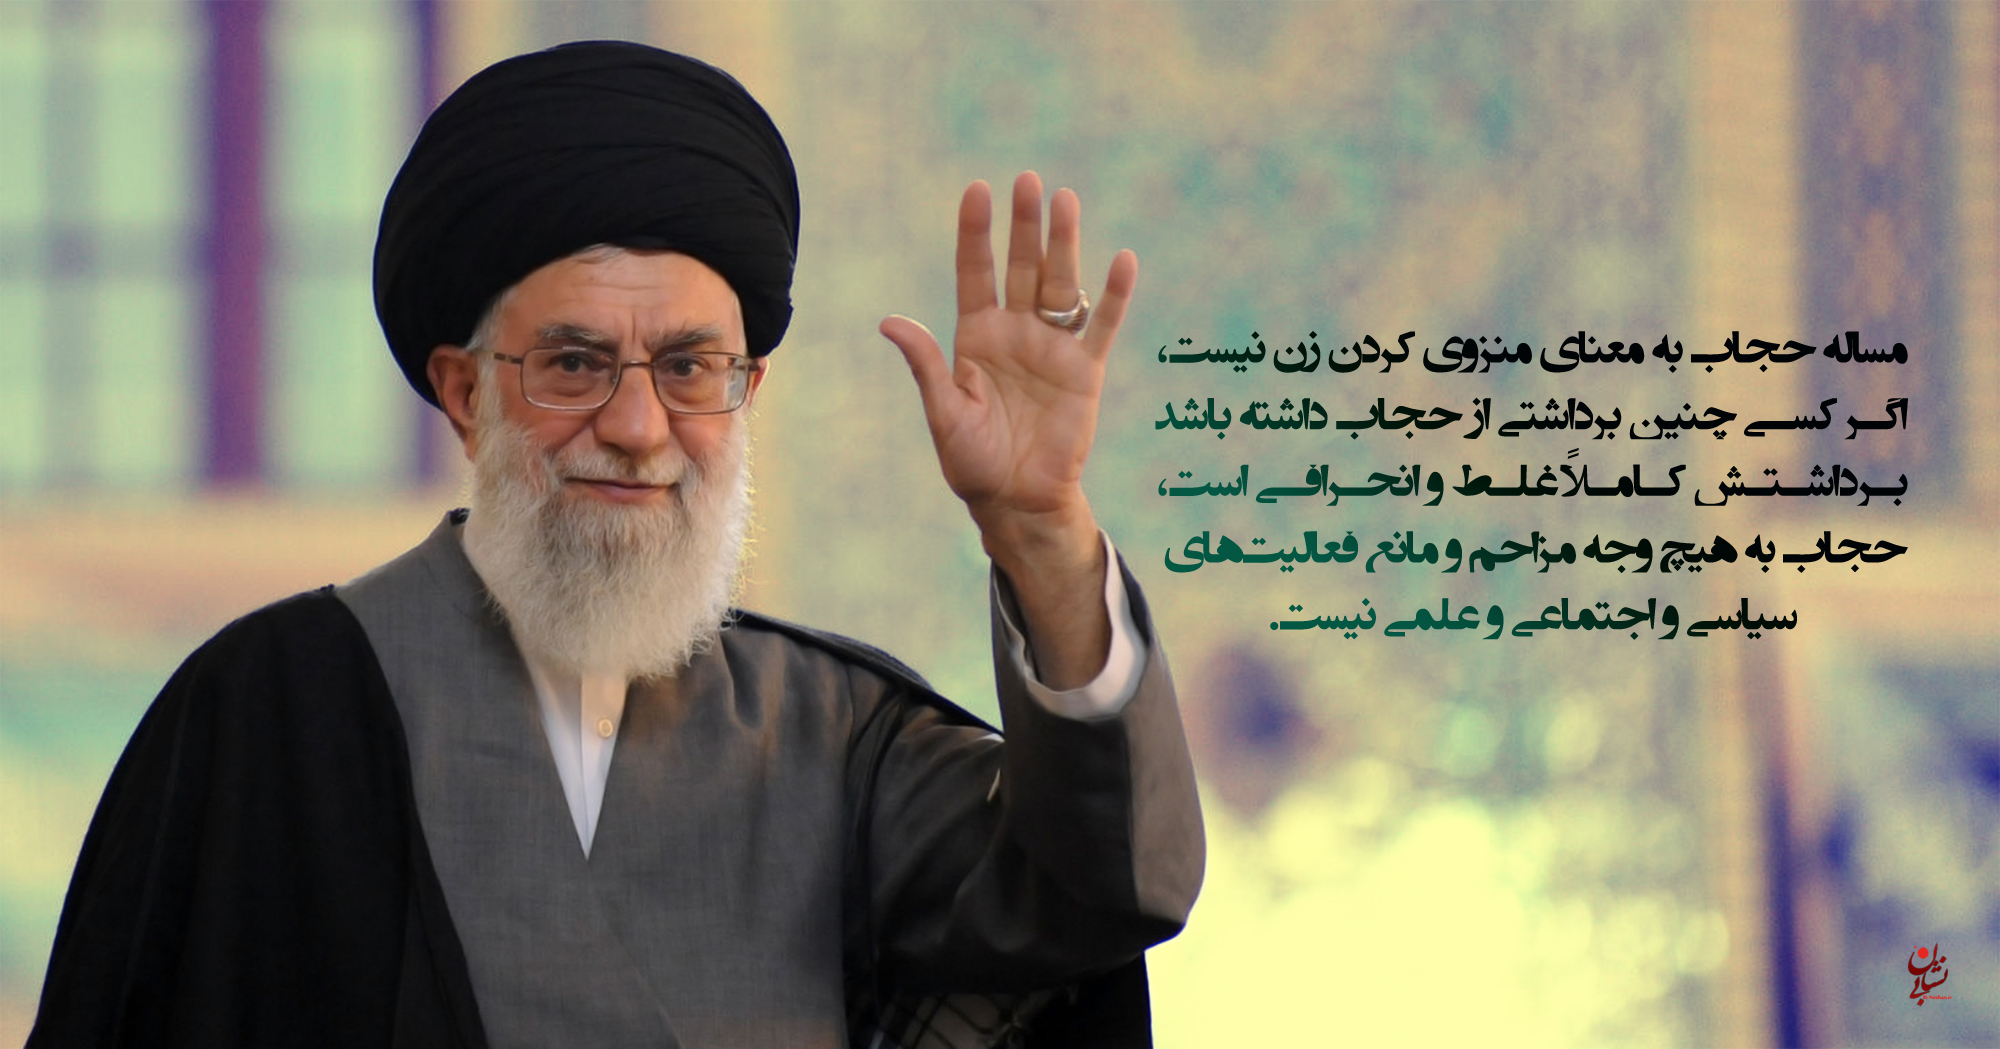 http://bi-neshan.ir/wp-content/uploads/2012/07/Seyed-Ali-36.jpg